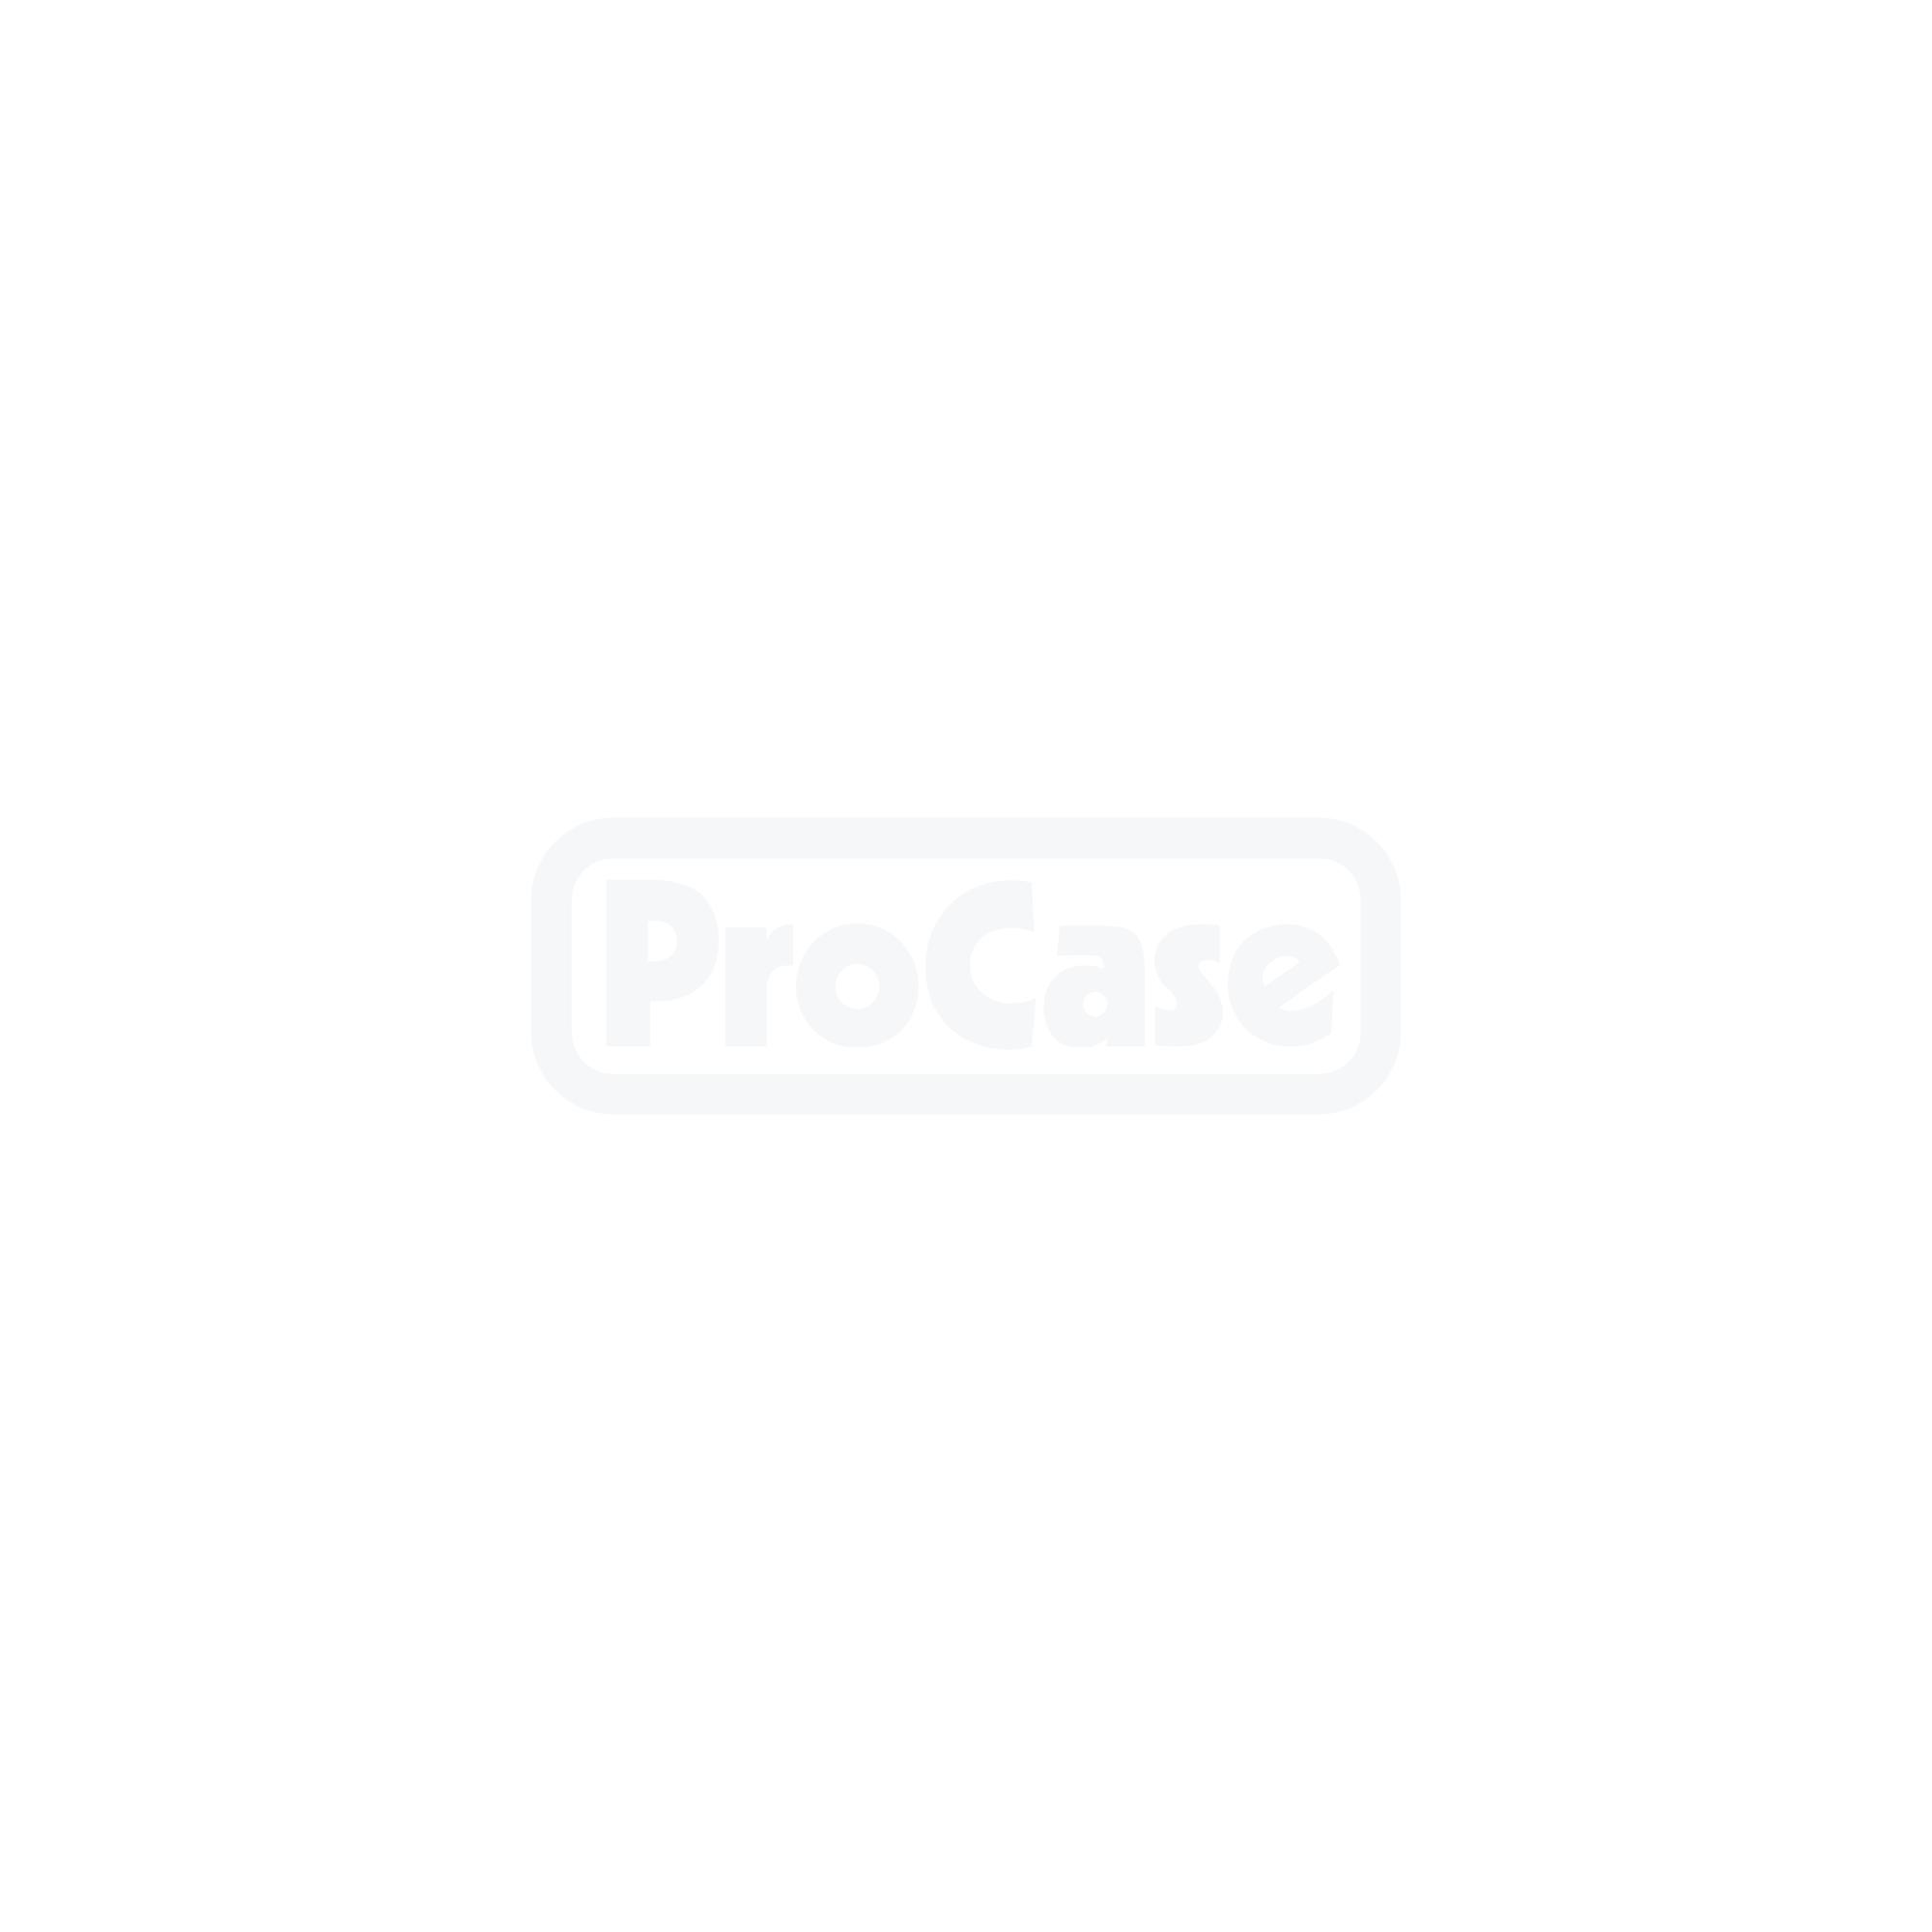 SKB 3i Koffer 2617-12B mit Rasterschaumstoff 2